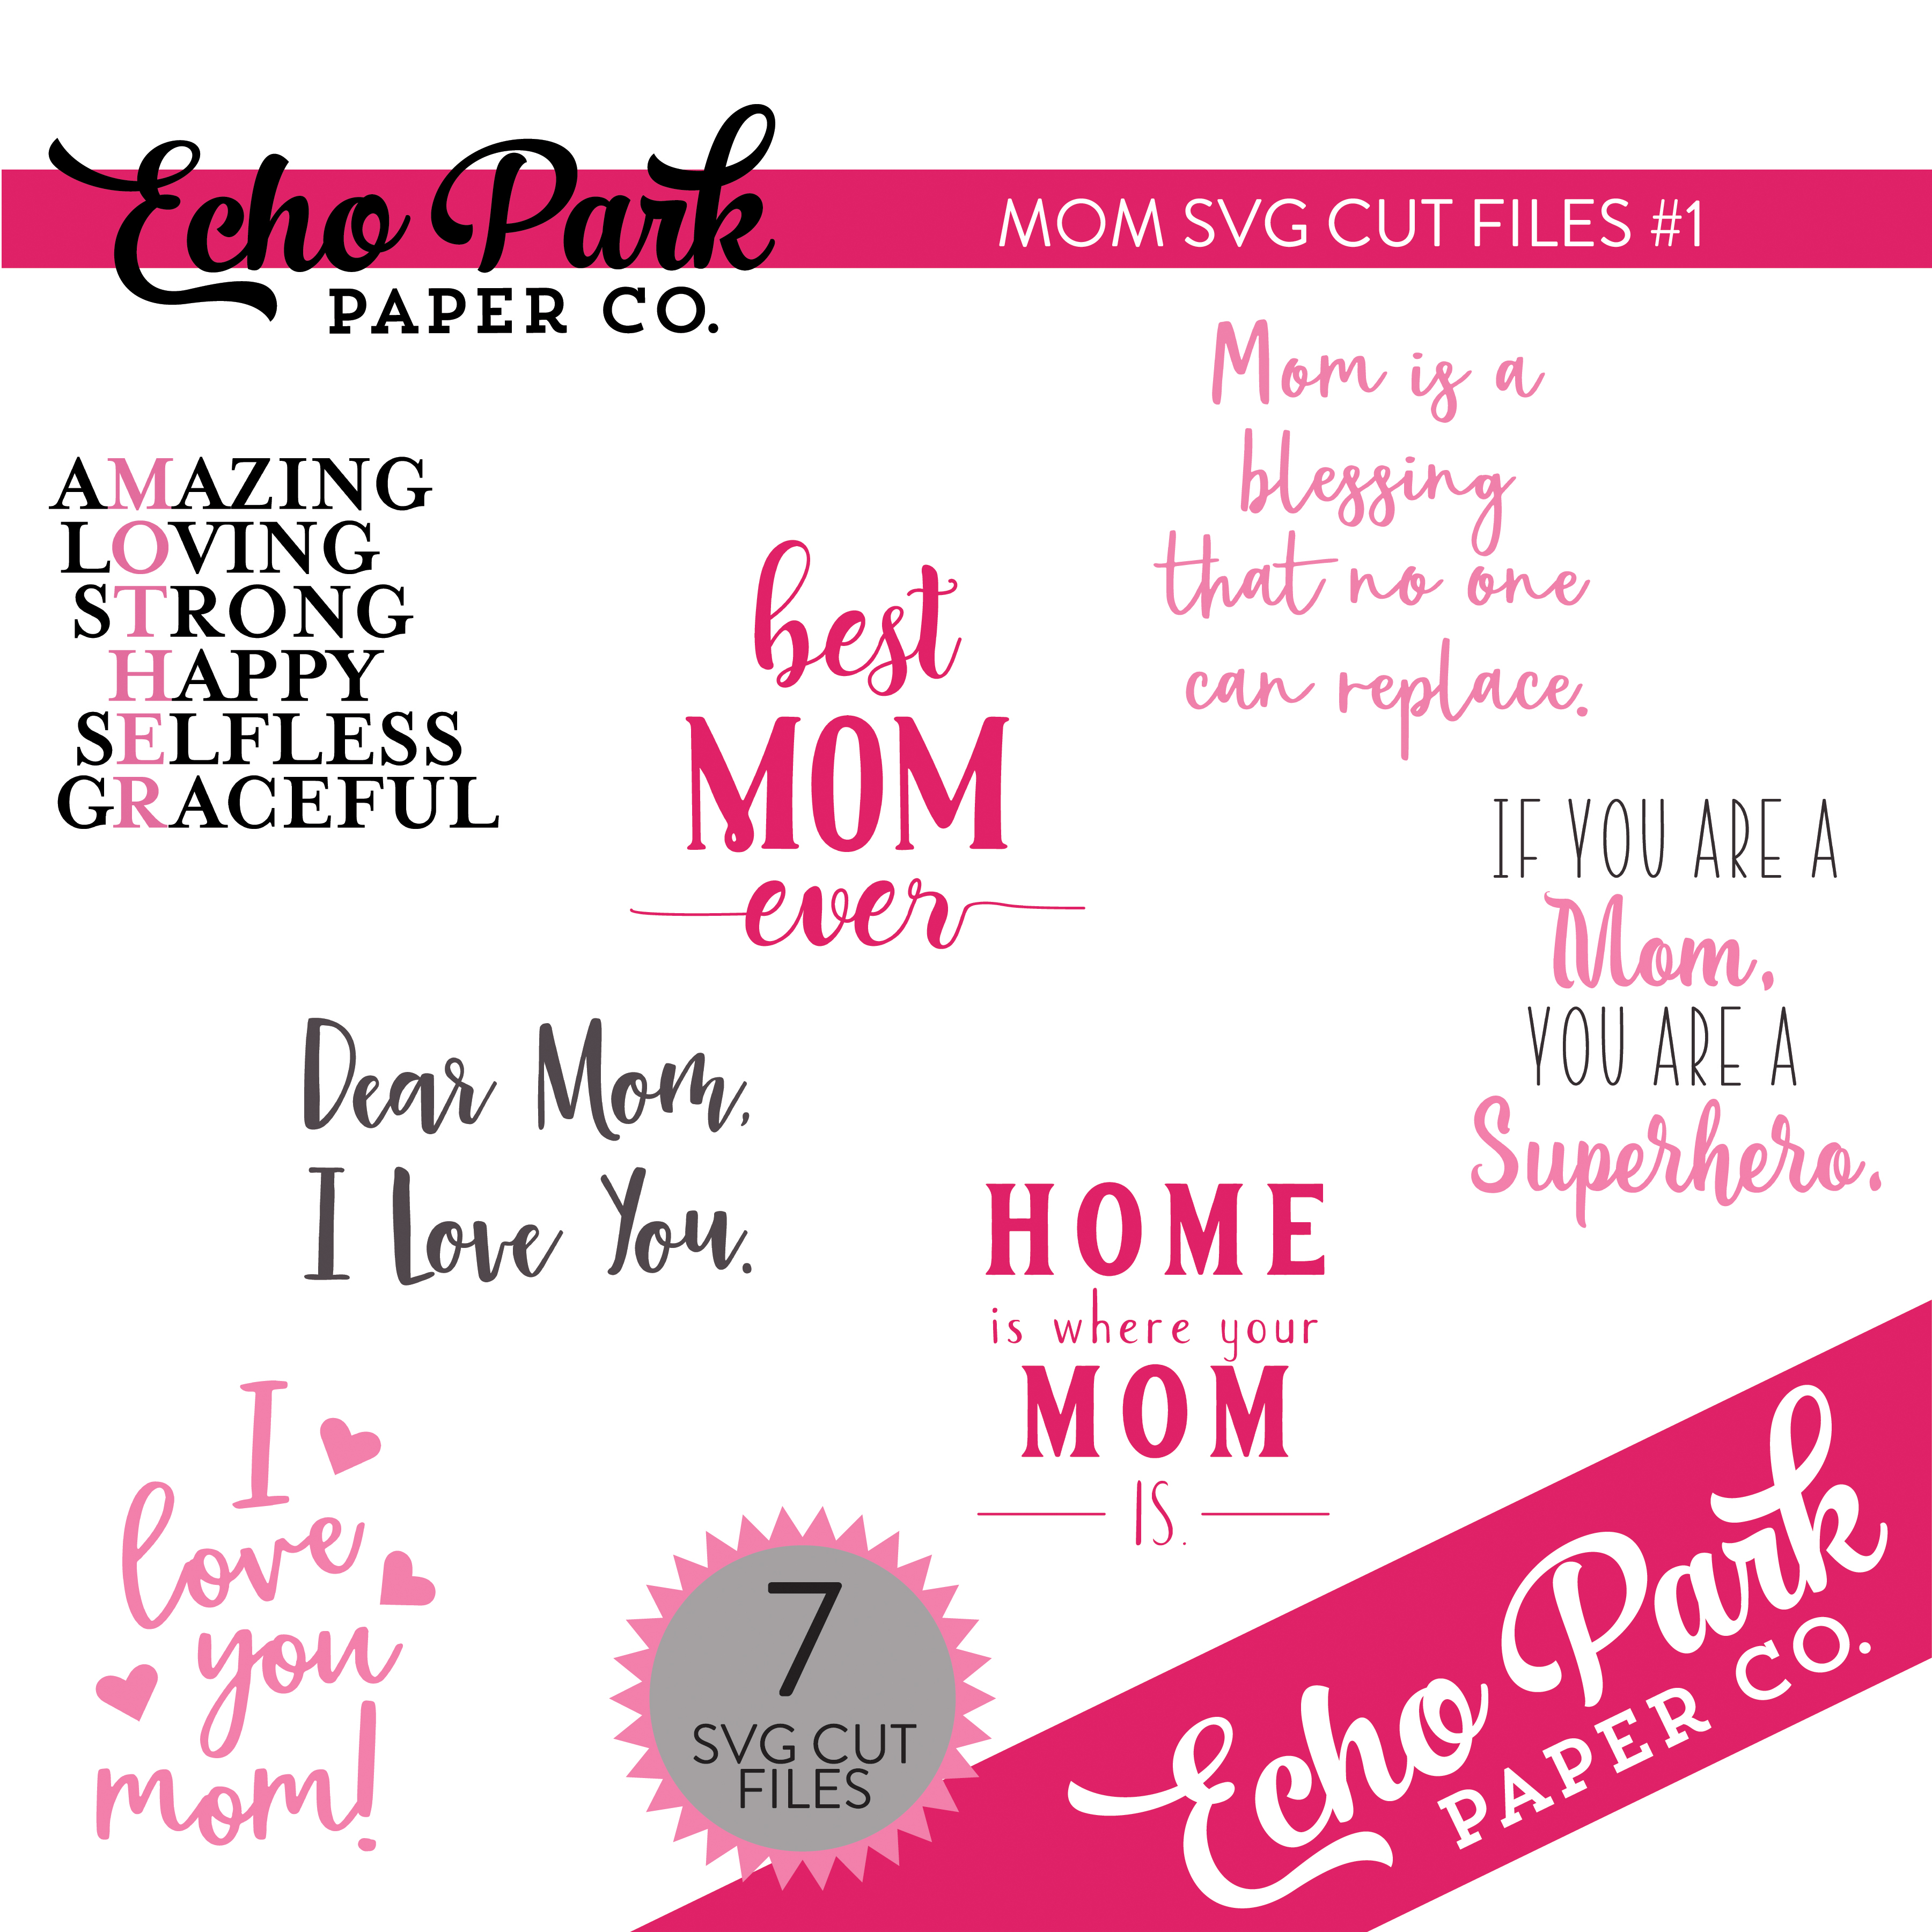 Mom SVG Cut Files #1